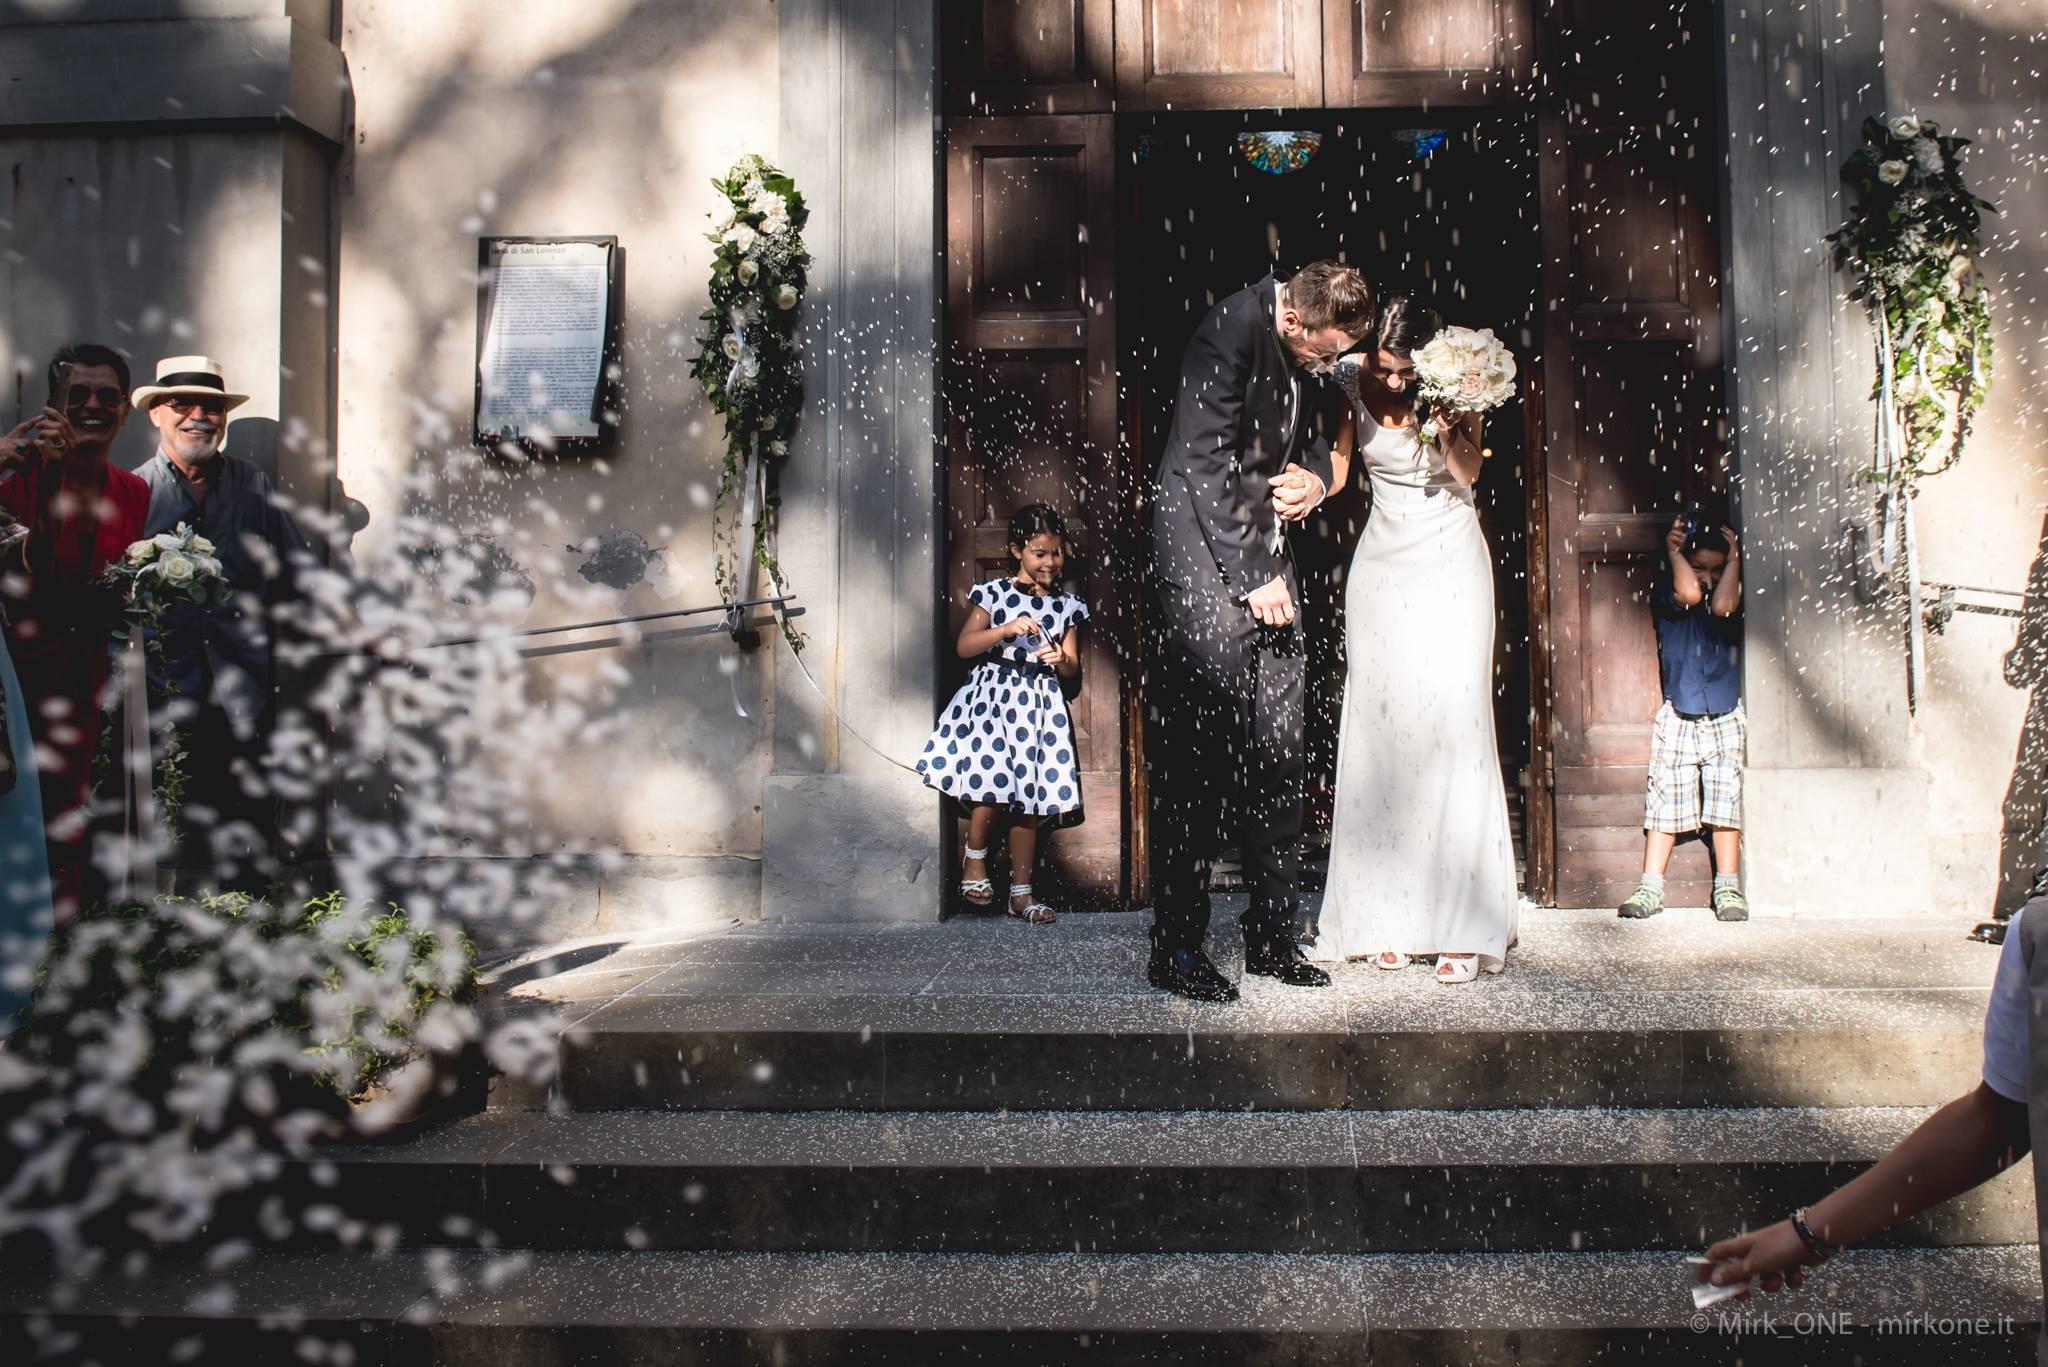 https://lnx.mirkone.it/wp-content/uploads/2015/07/mirk_ONE-fotografo-matrimonio-00120.jpg